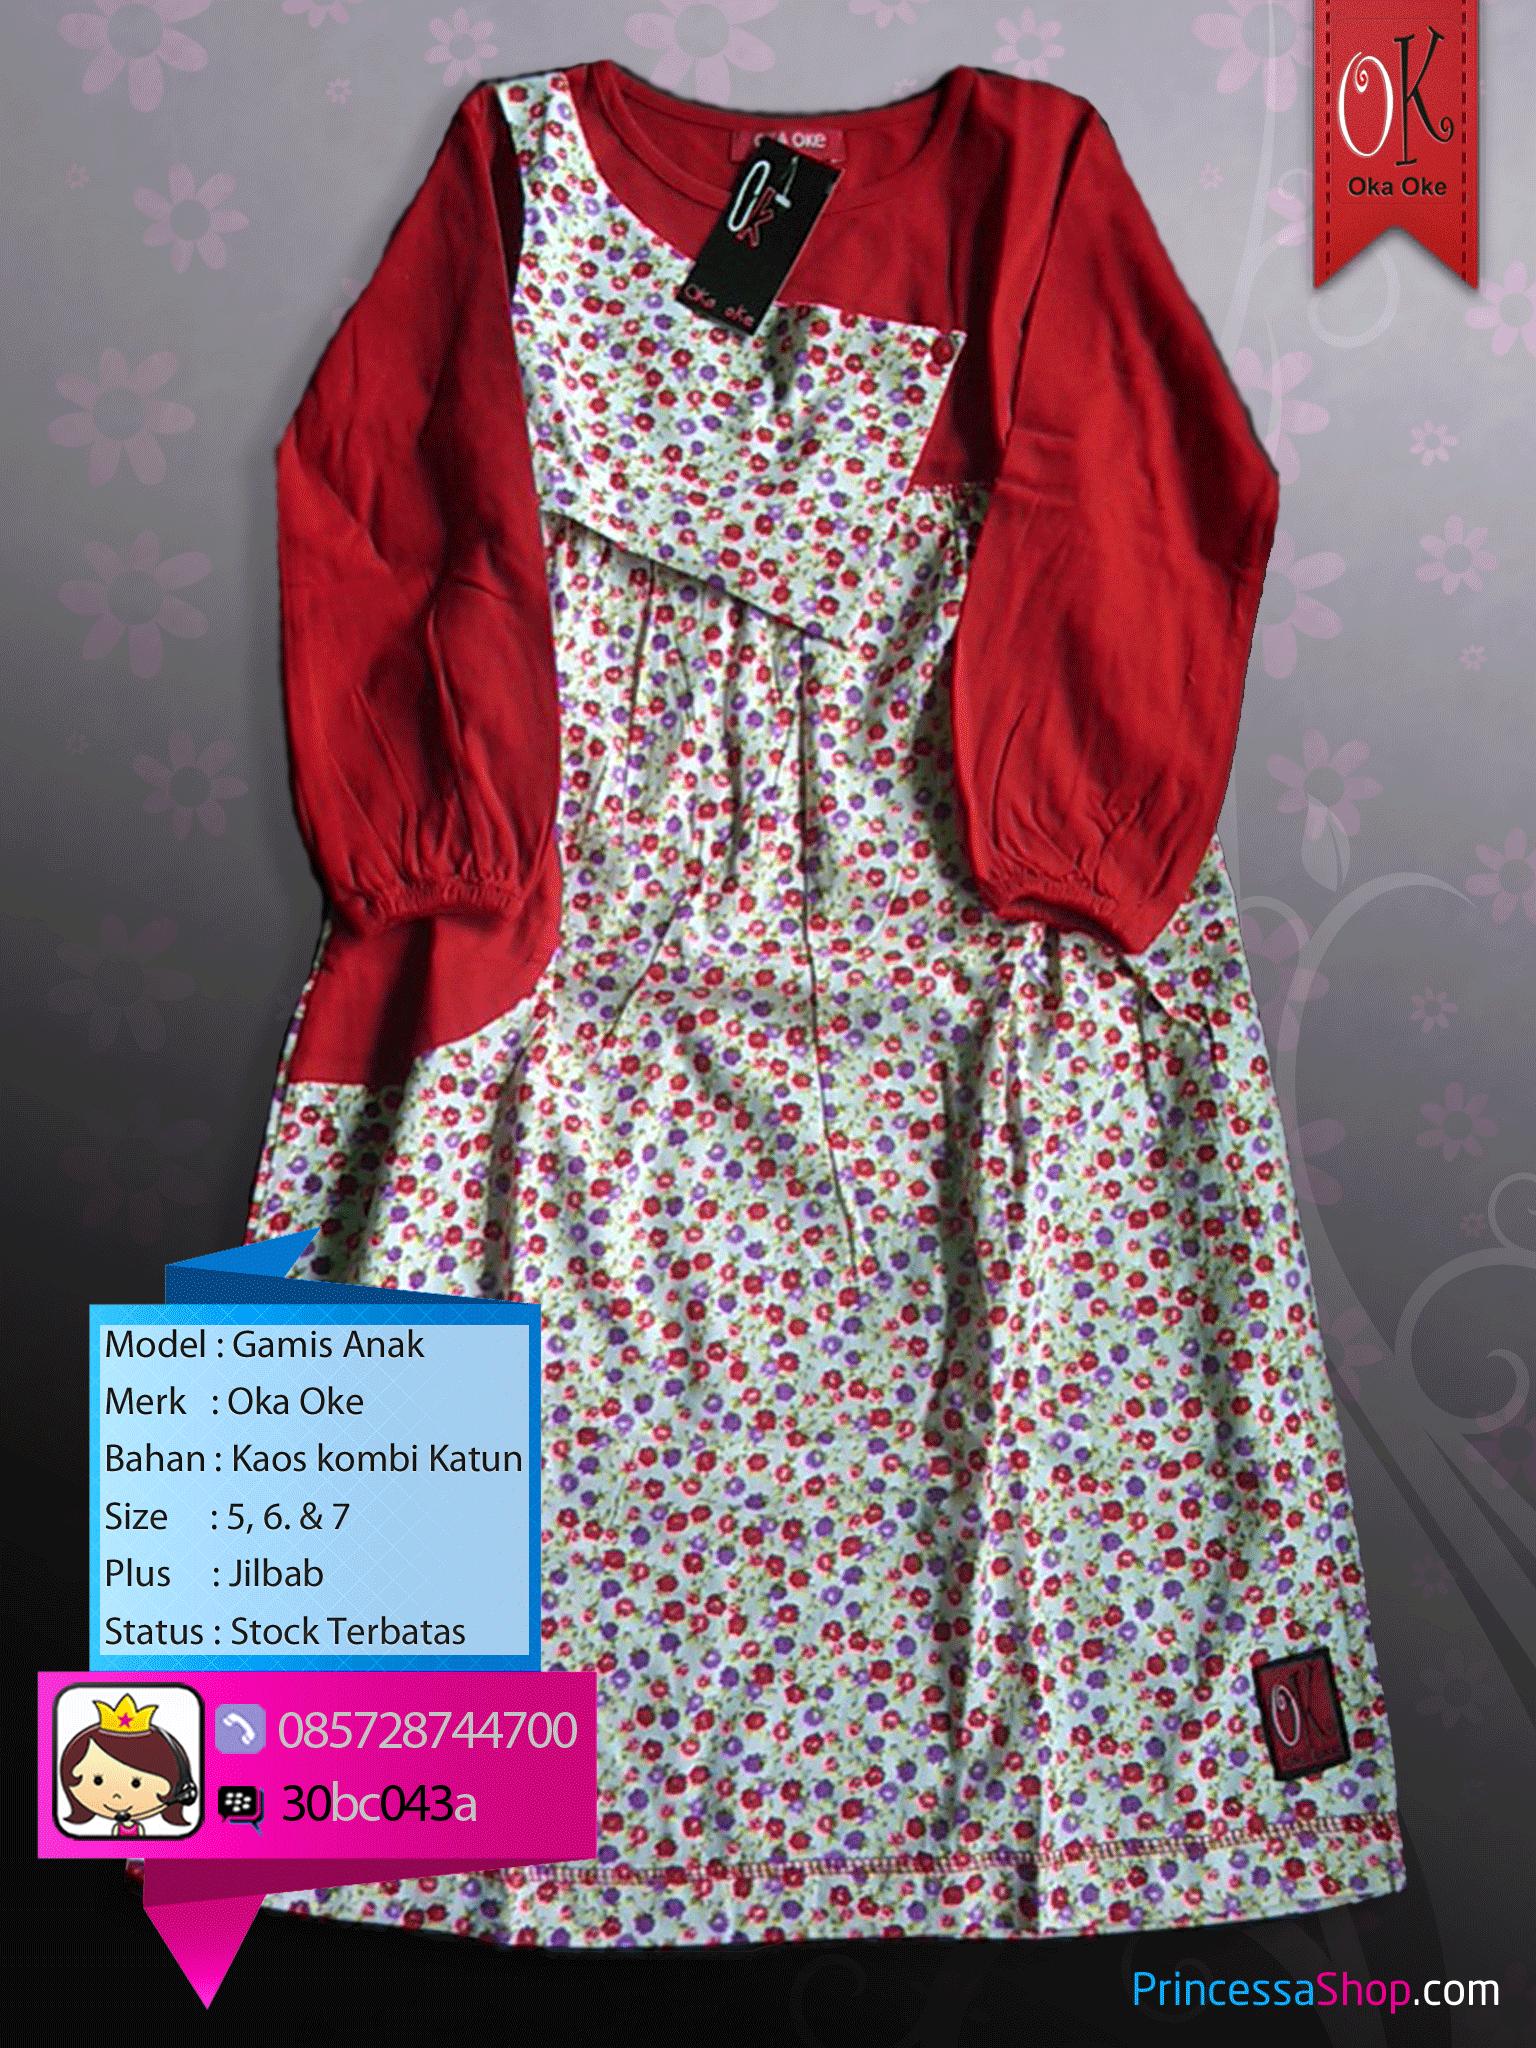 Baju Muslim Anak Plus Jilbab Model Terbaru dari Oka Oke.  d12b8a4ab0